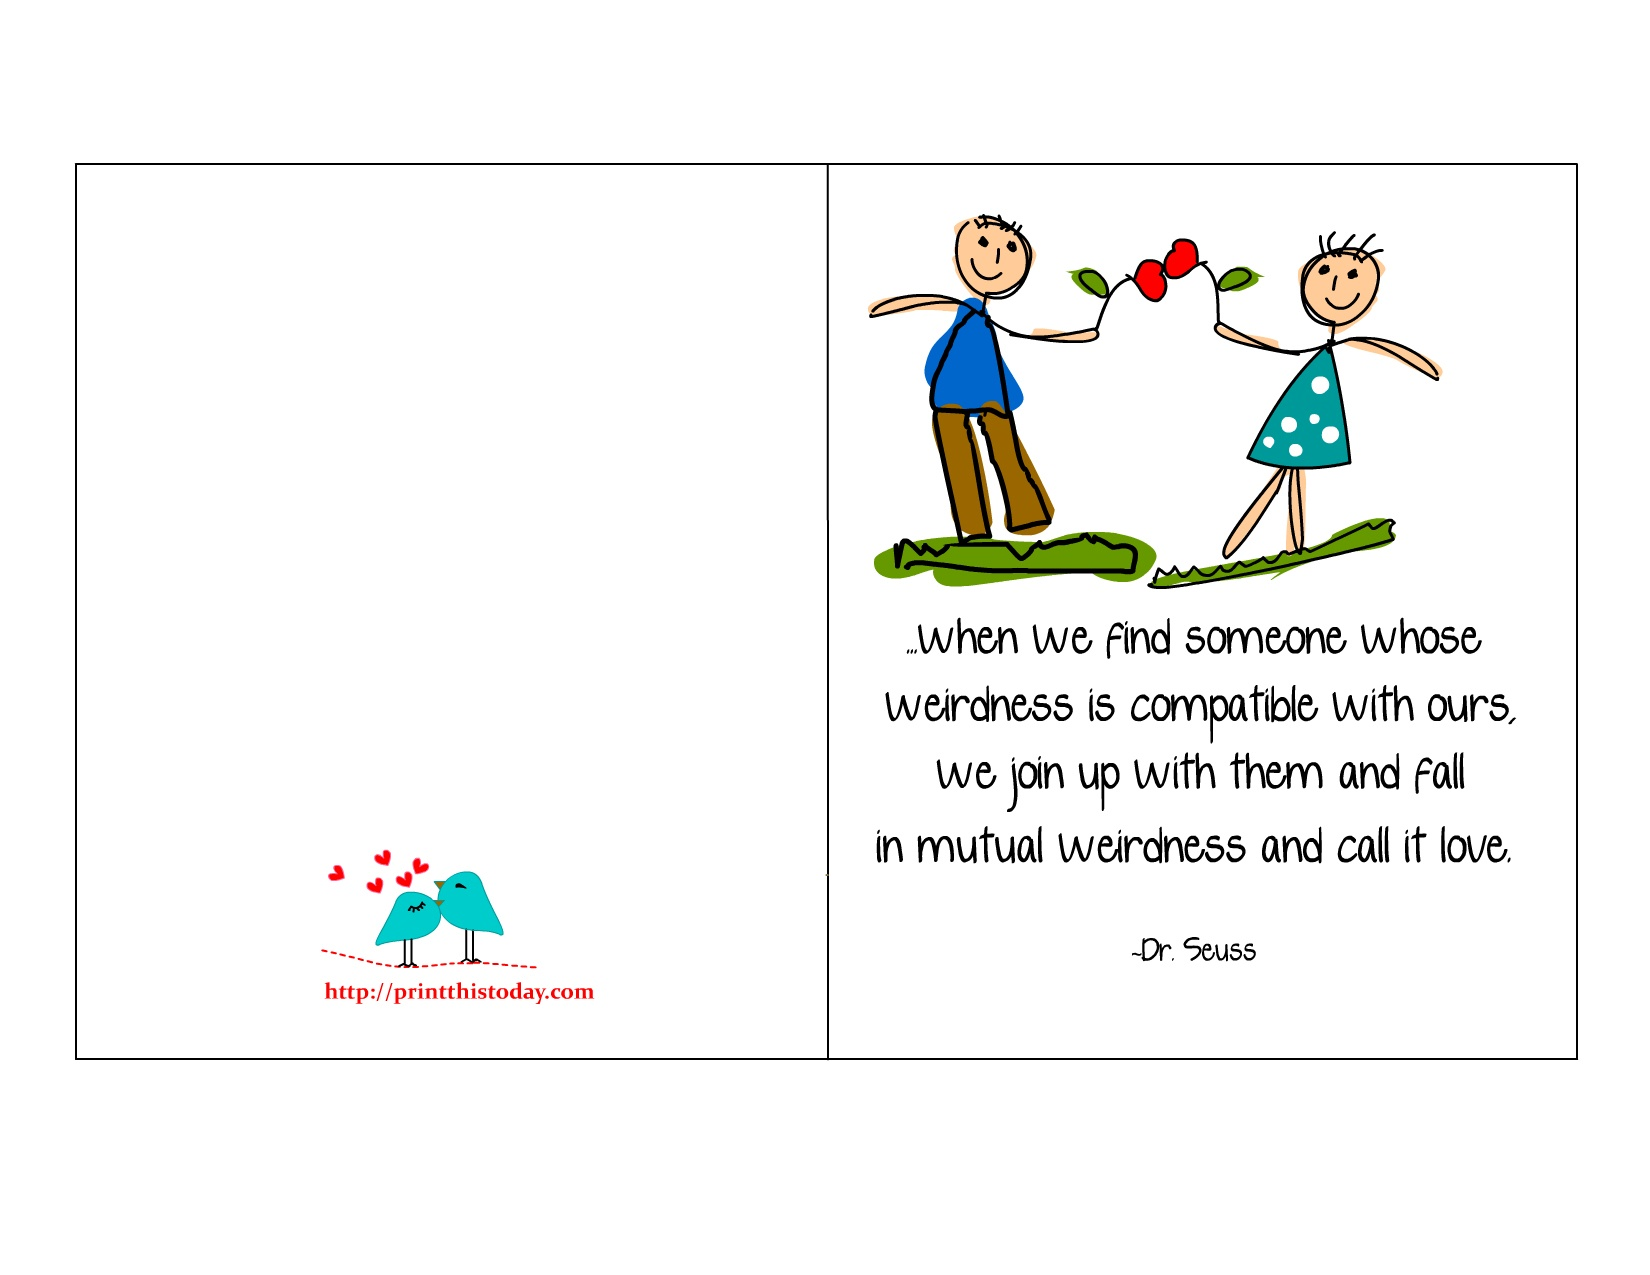 94+ Printable Birthday Cards For Him Romantic - Ecards Birthday For - Free Printable Romantic Birthday Cards